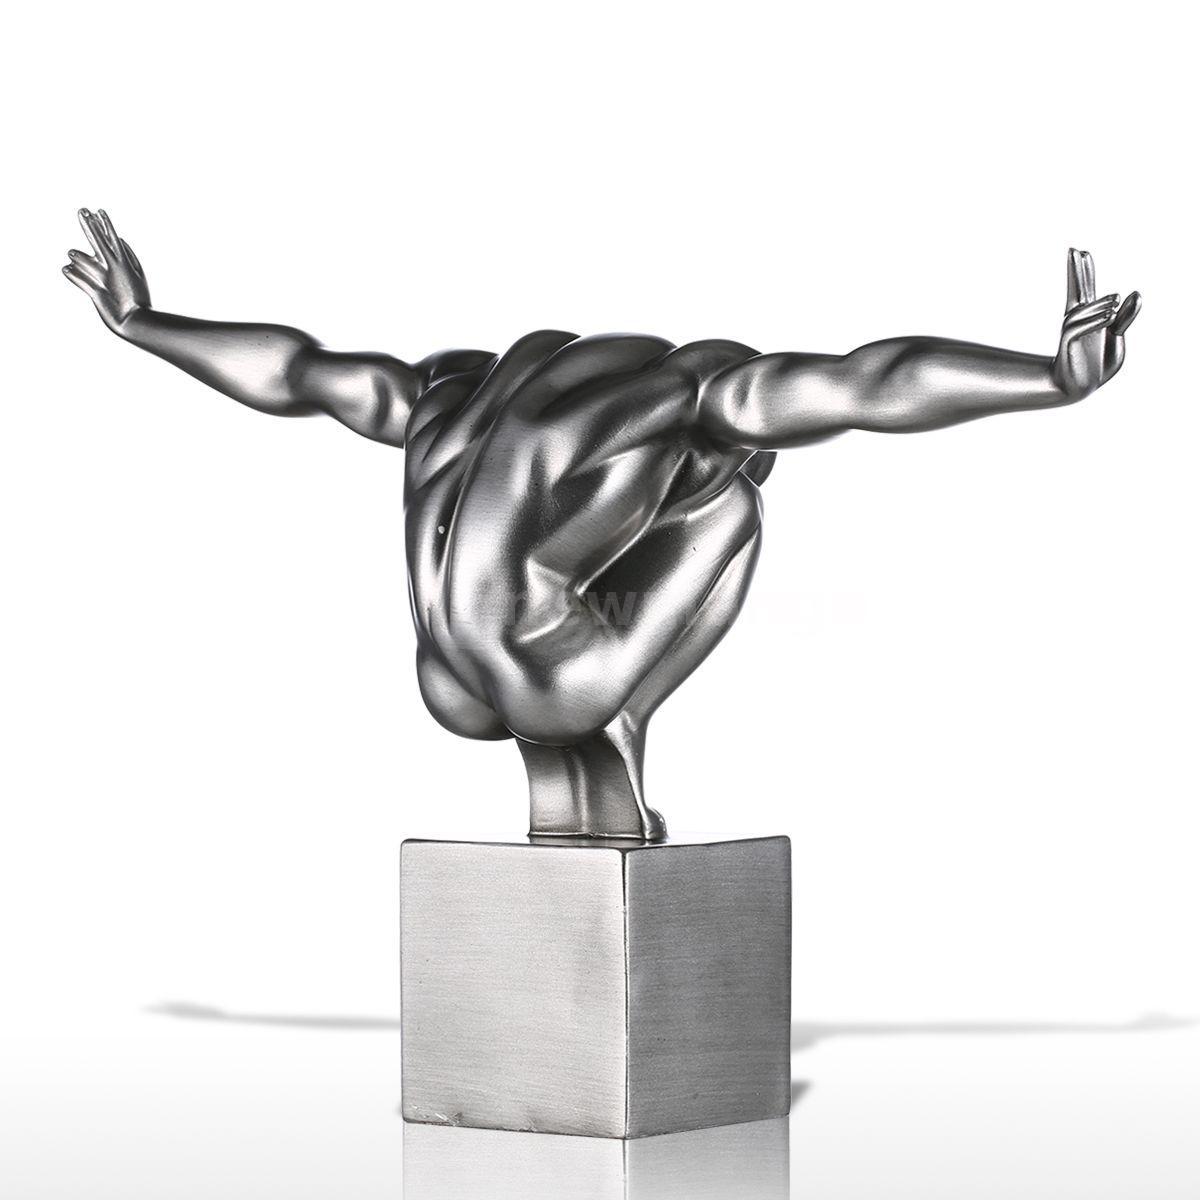 Tooarts Diver Fibergl Modern Sculpture Home Decor Diving Figurine Statue Y6d4